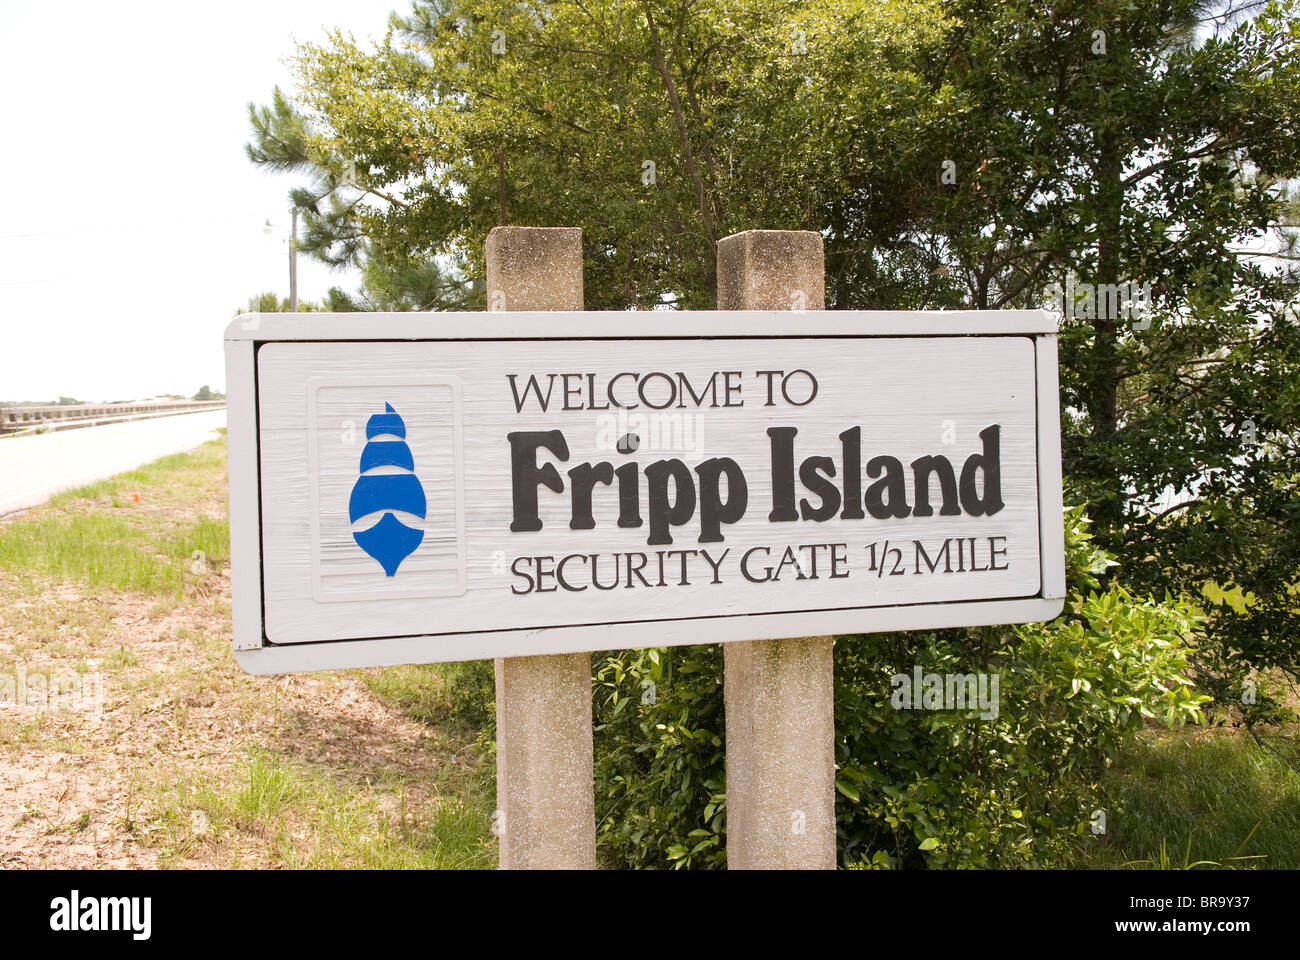 Bienvenue à Fripp Island Caroline du Sud USA signe Photo Stock